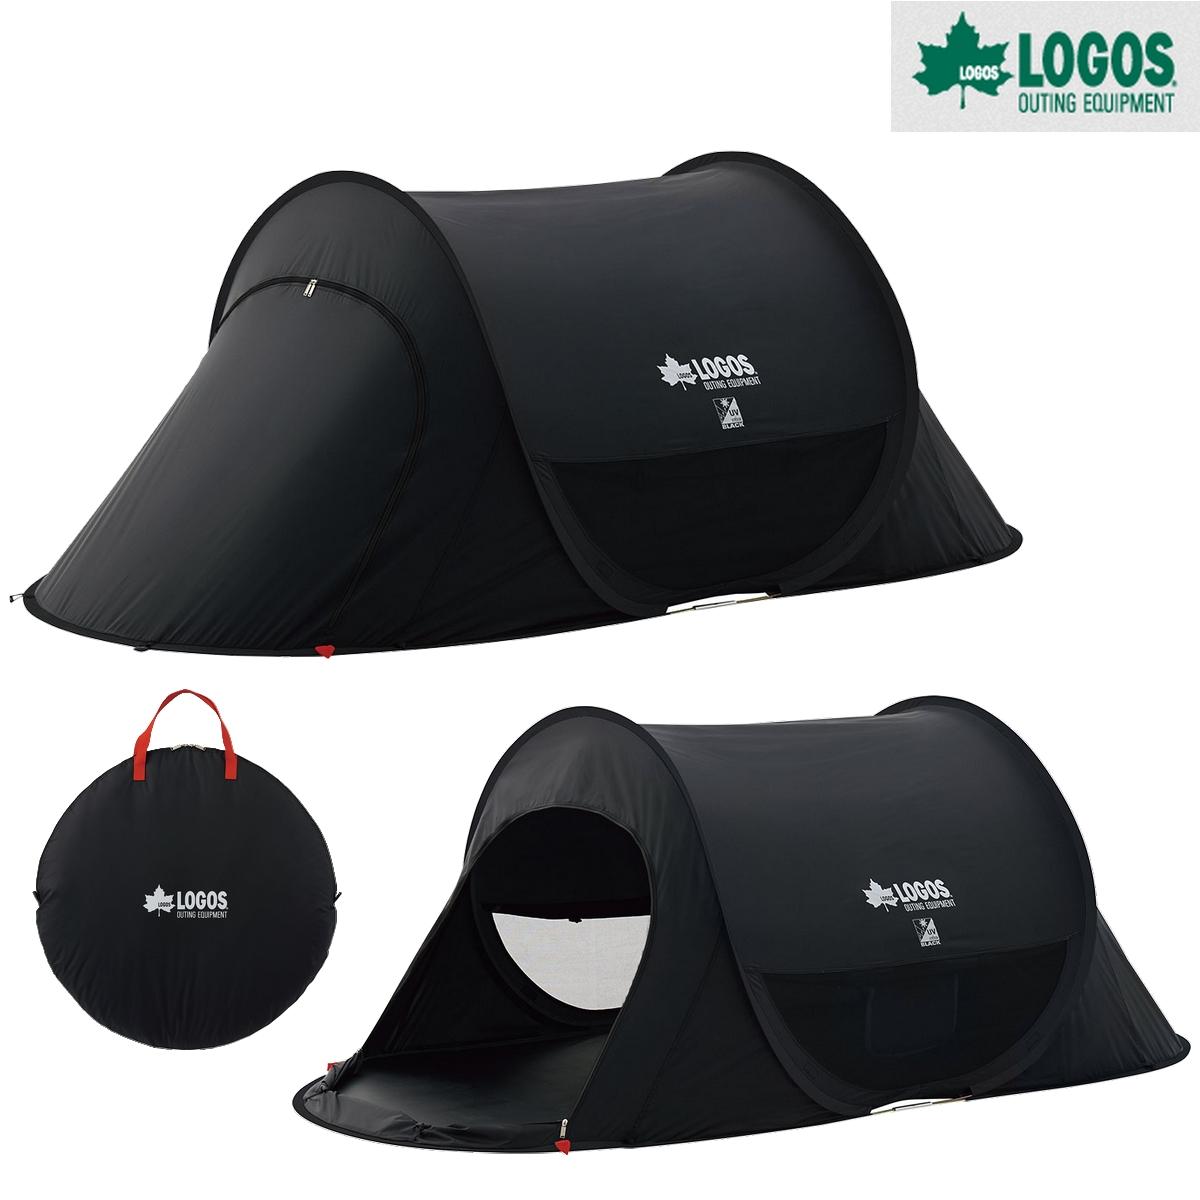 LOGOS UV ポップフルシェルター-AG 71809022 ブラック 約235×113×90cm、総重量:約1.9kg 4981325525316